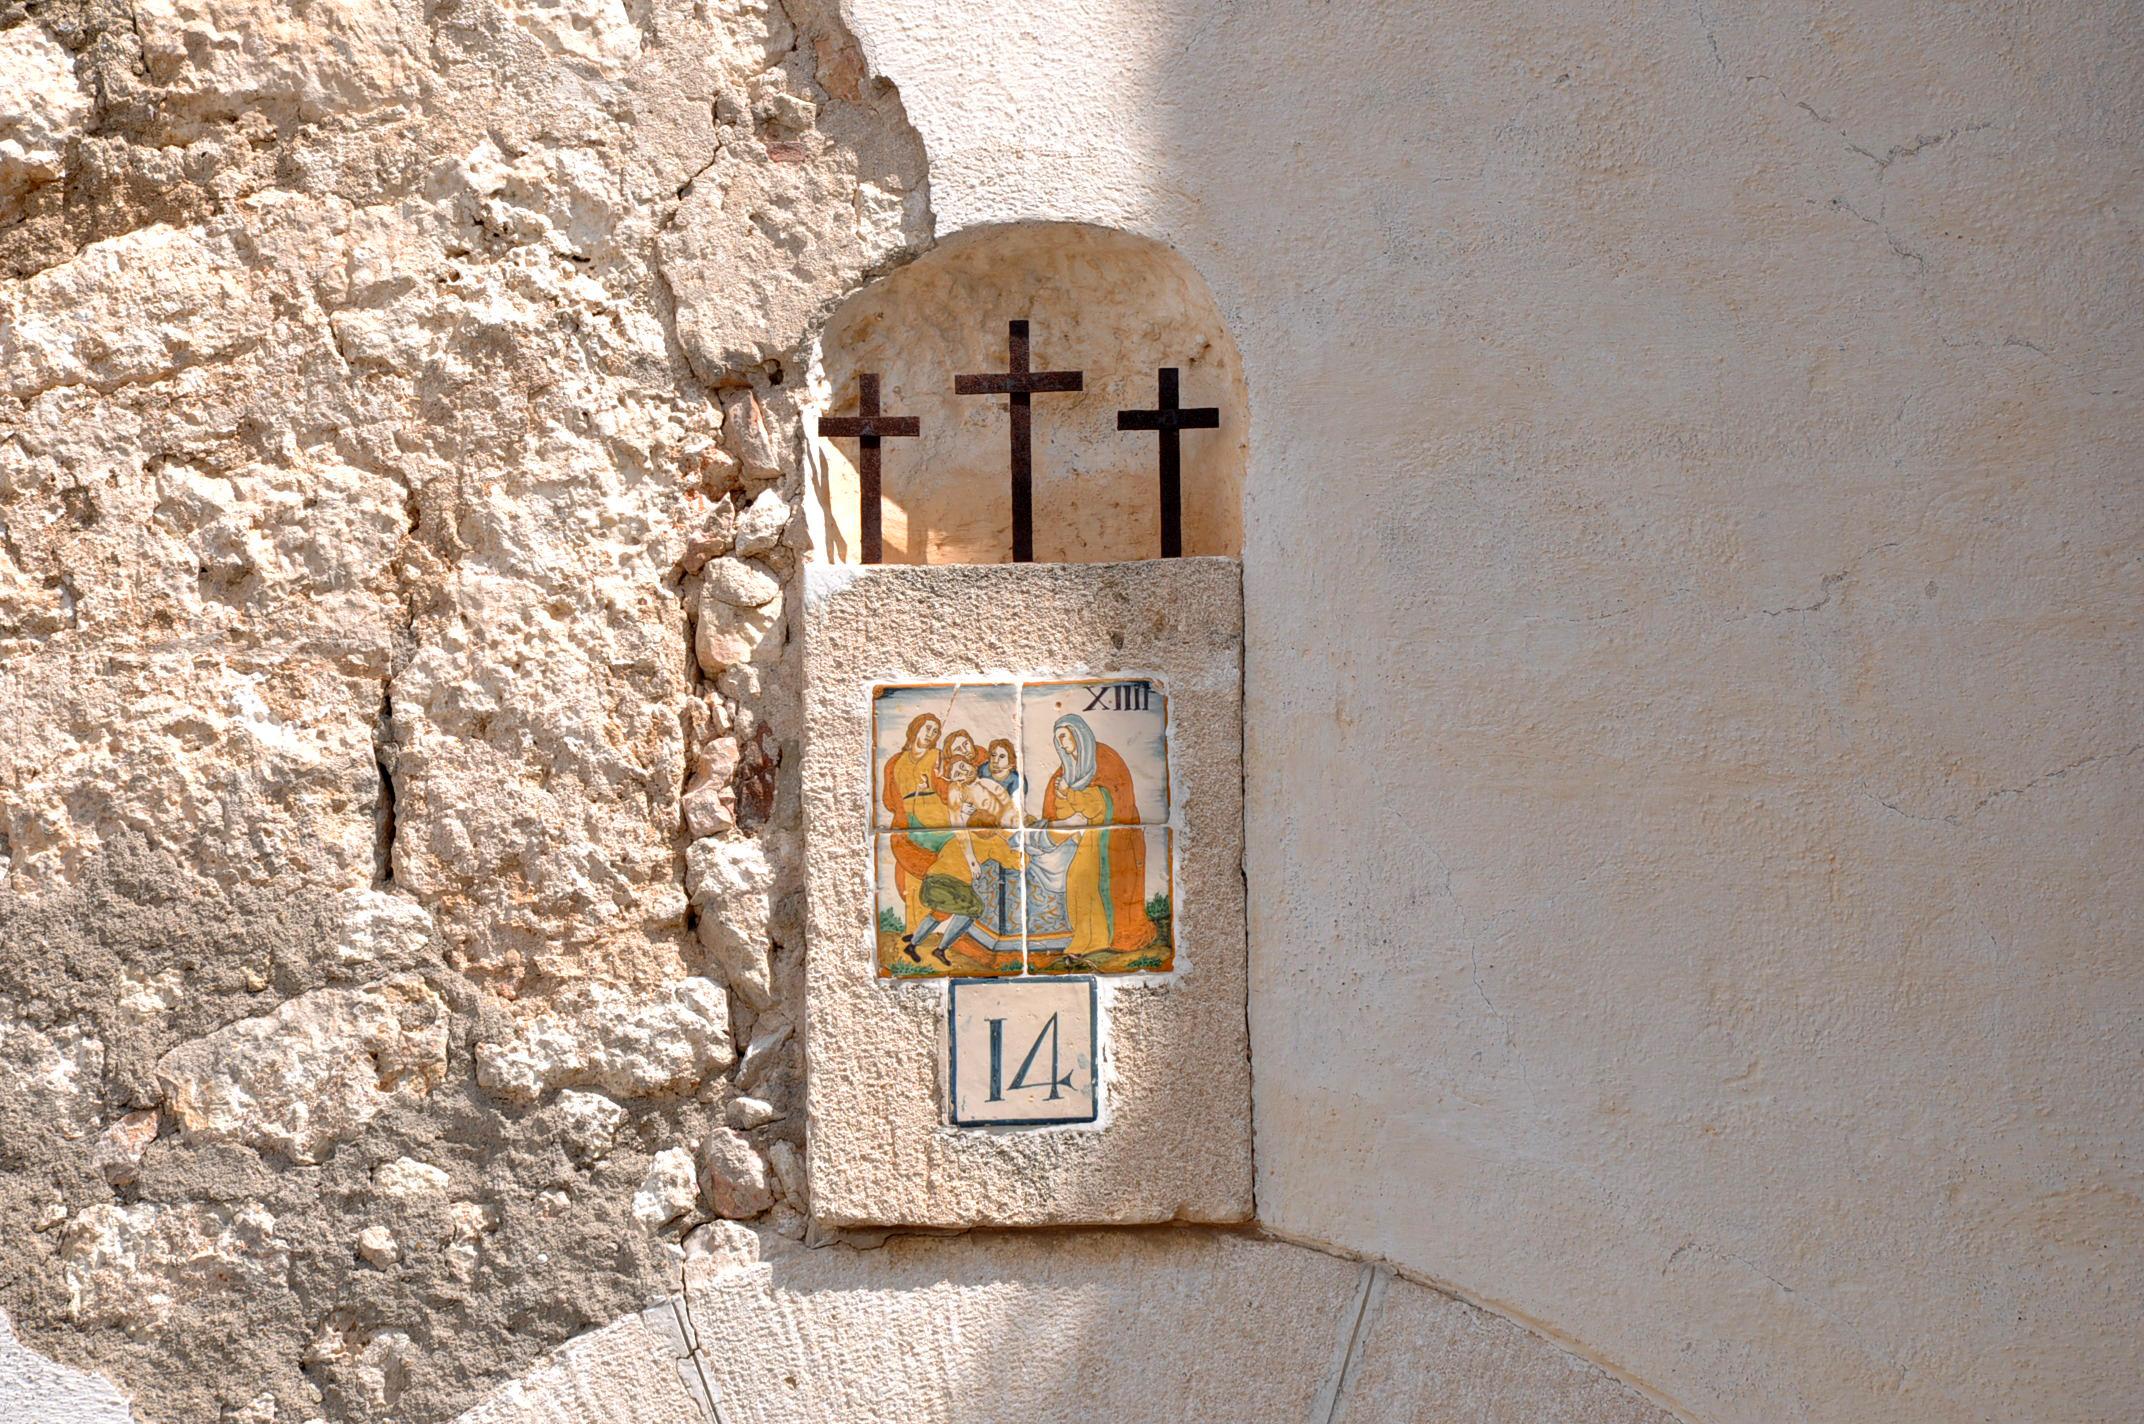 capilla-sant-sepulcre-masia-del-marques-detalle